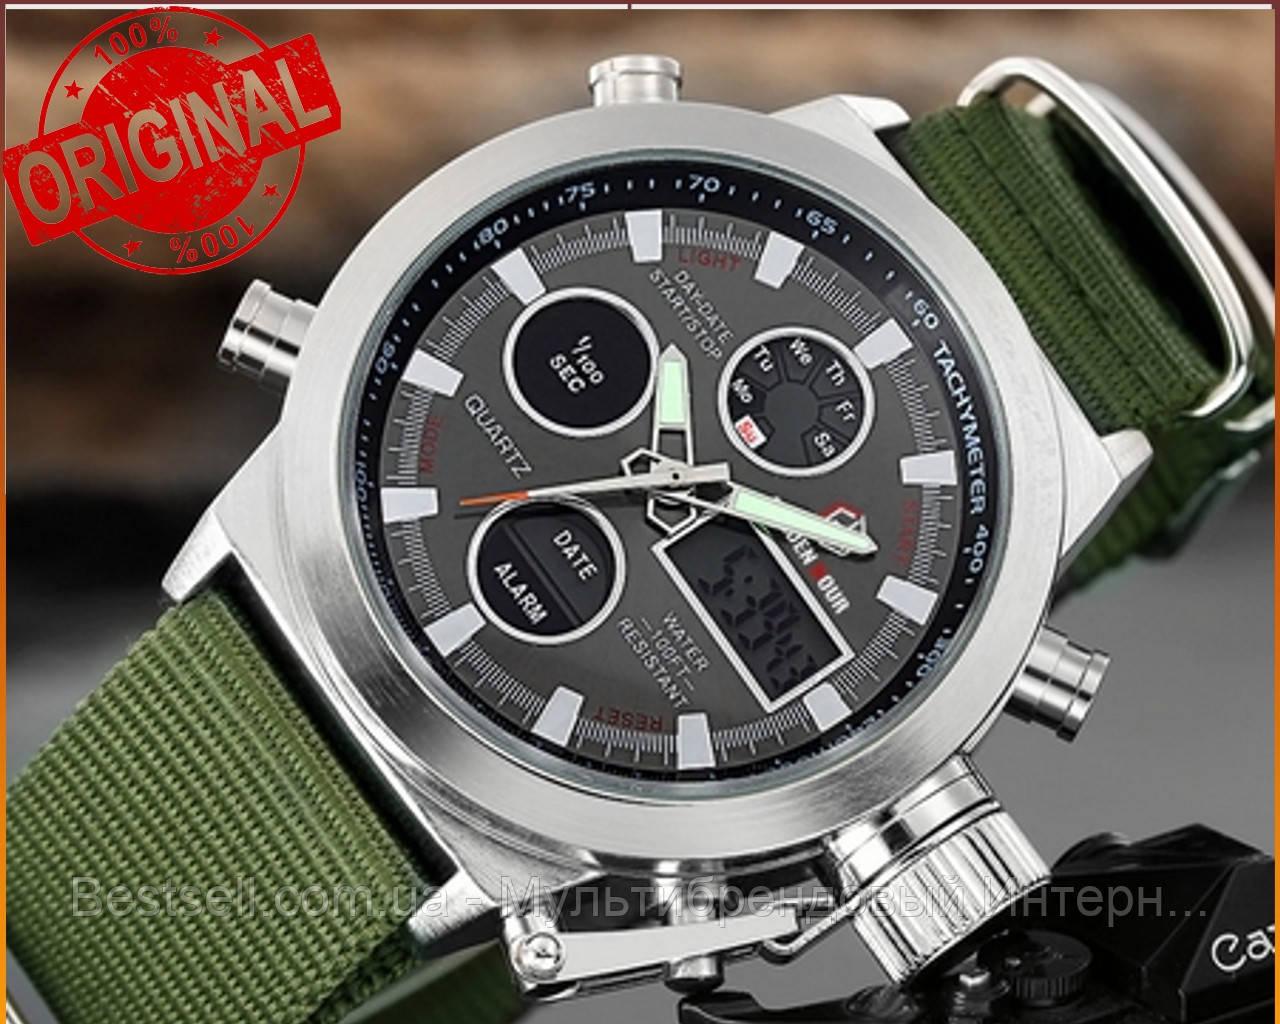 Оригинальные мужские часы AMST 3003 Silver-Black Green Wristband